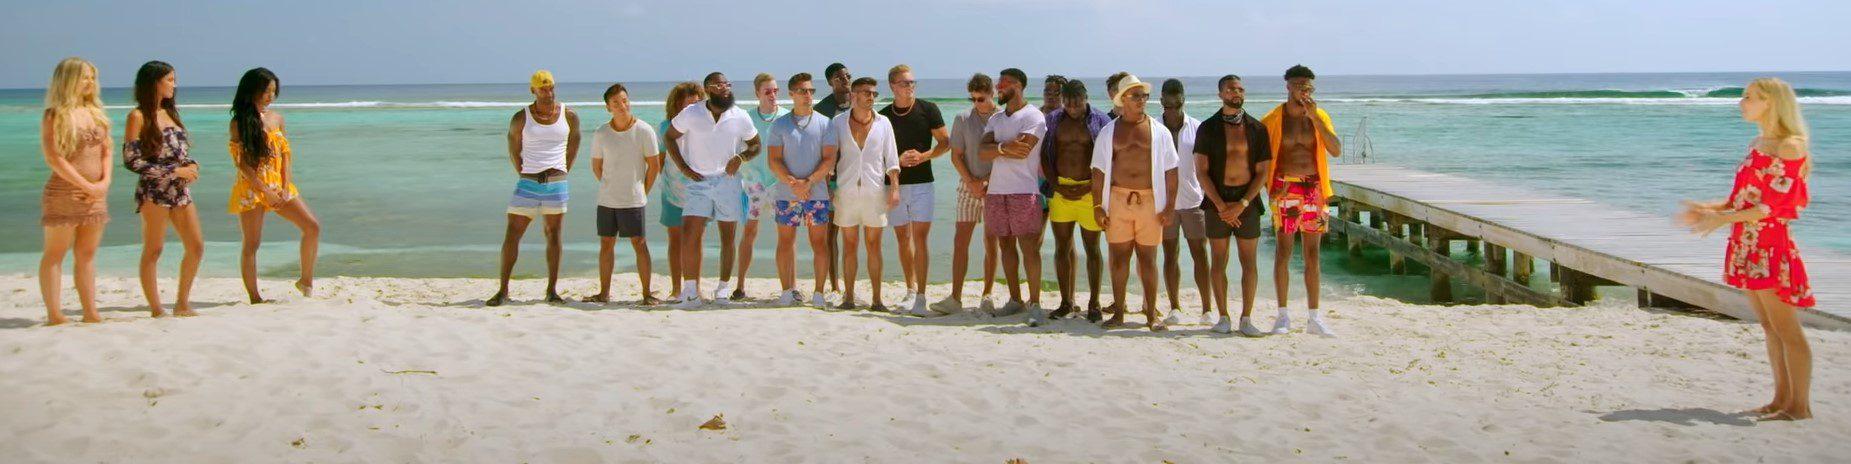 Fboy island are they still together?